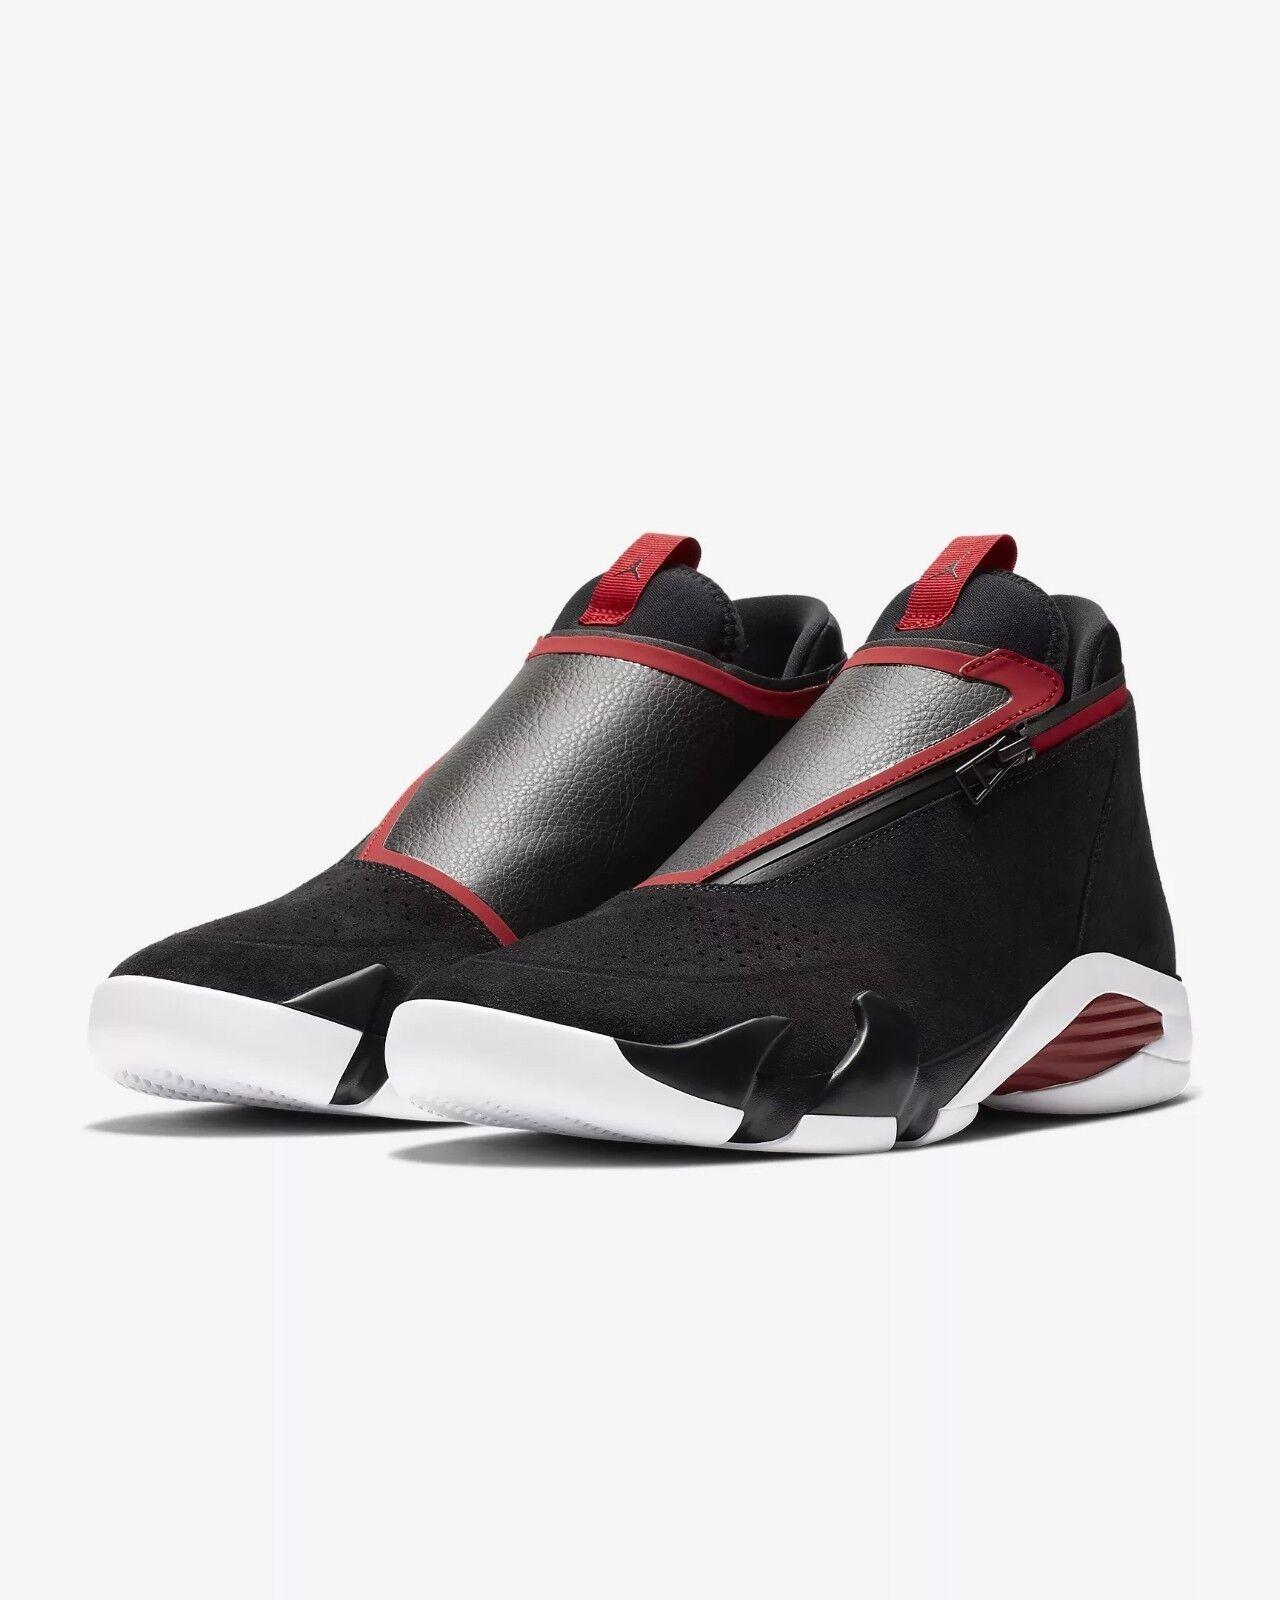 AQ9119-001 Jordan Jumpman Z inspired by Jordan 14 Blk Wht-Gym Red Sizes 8-13 NIB